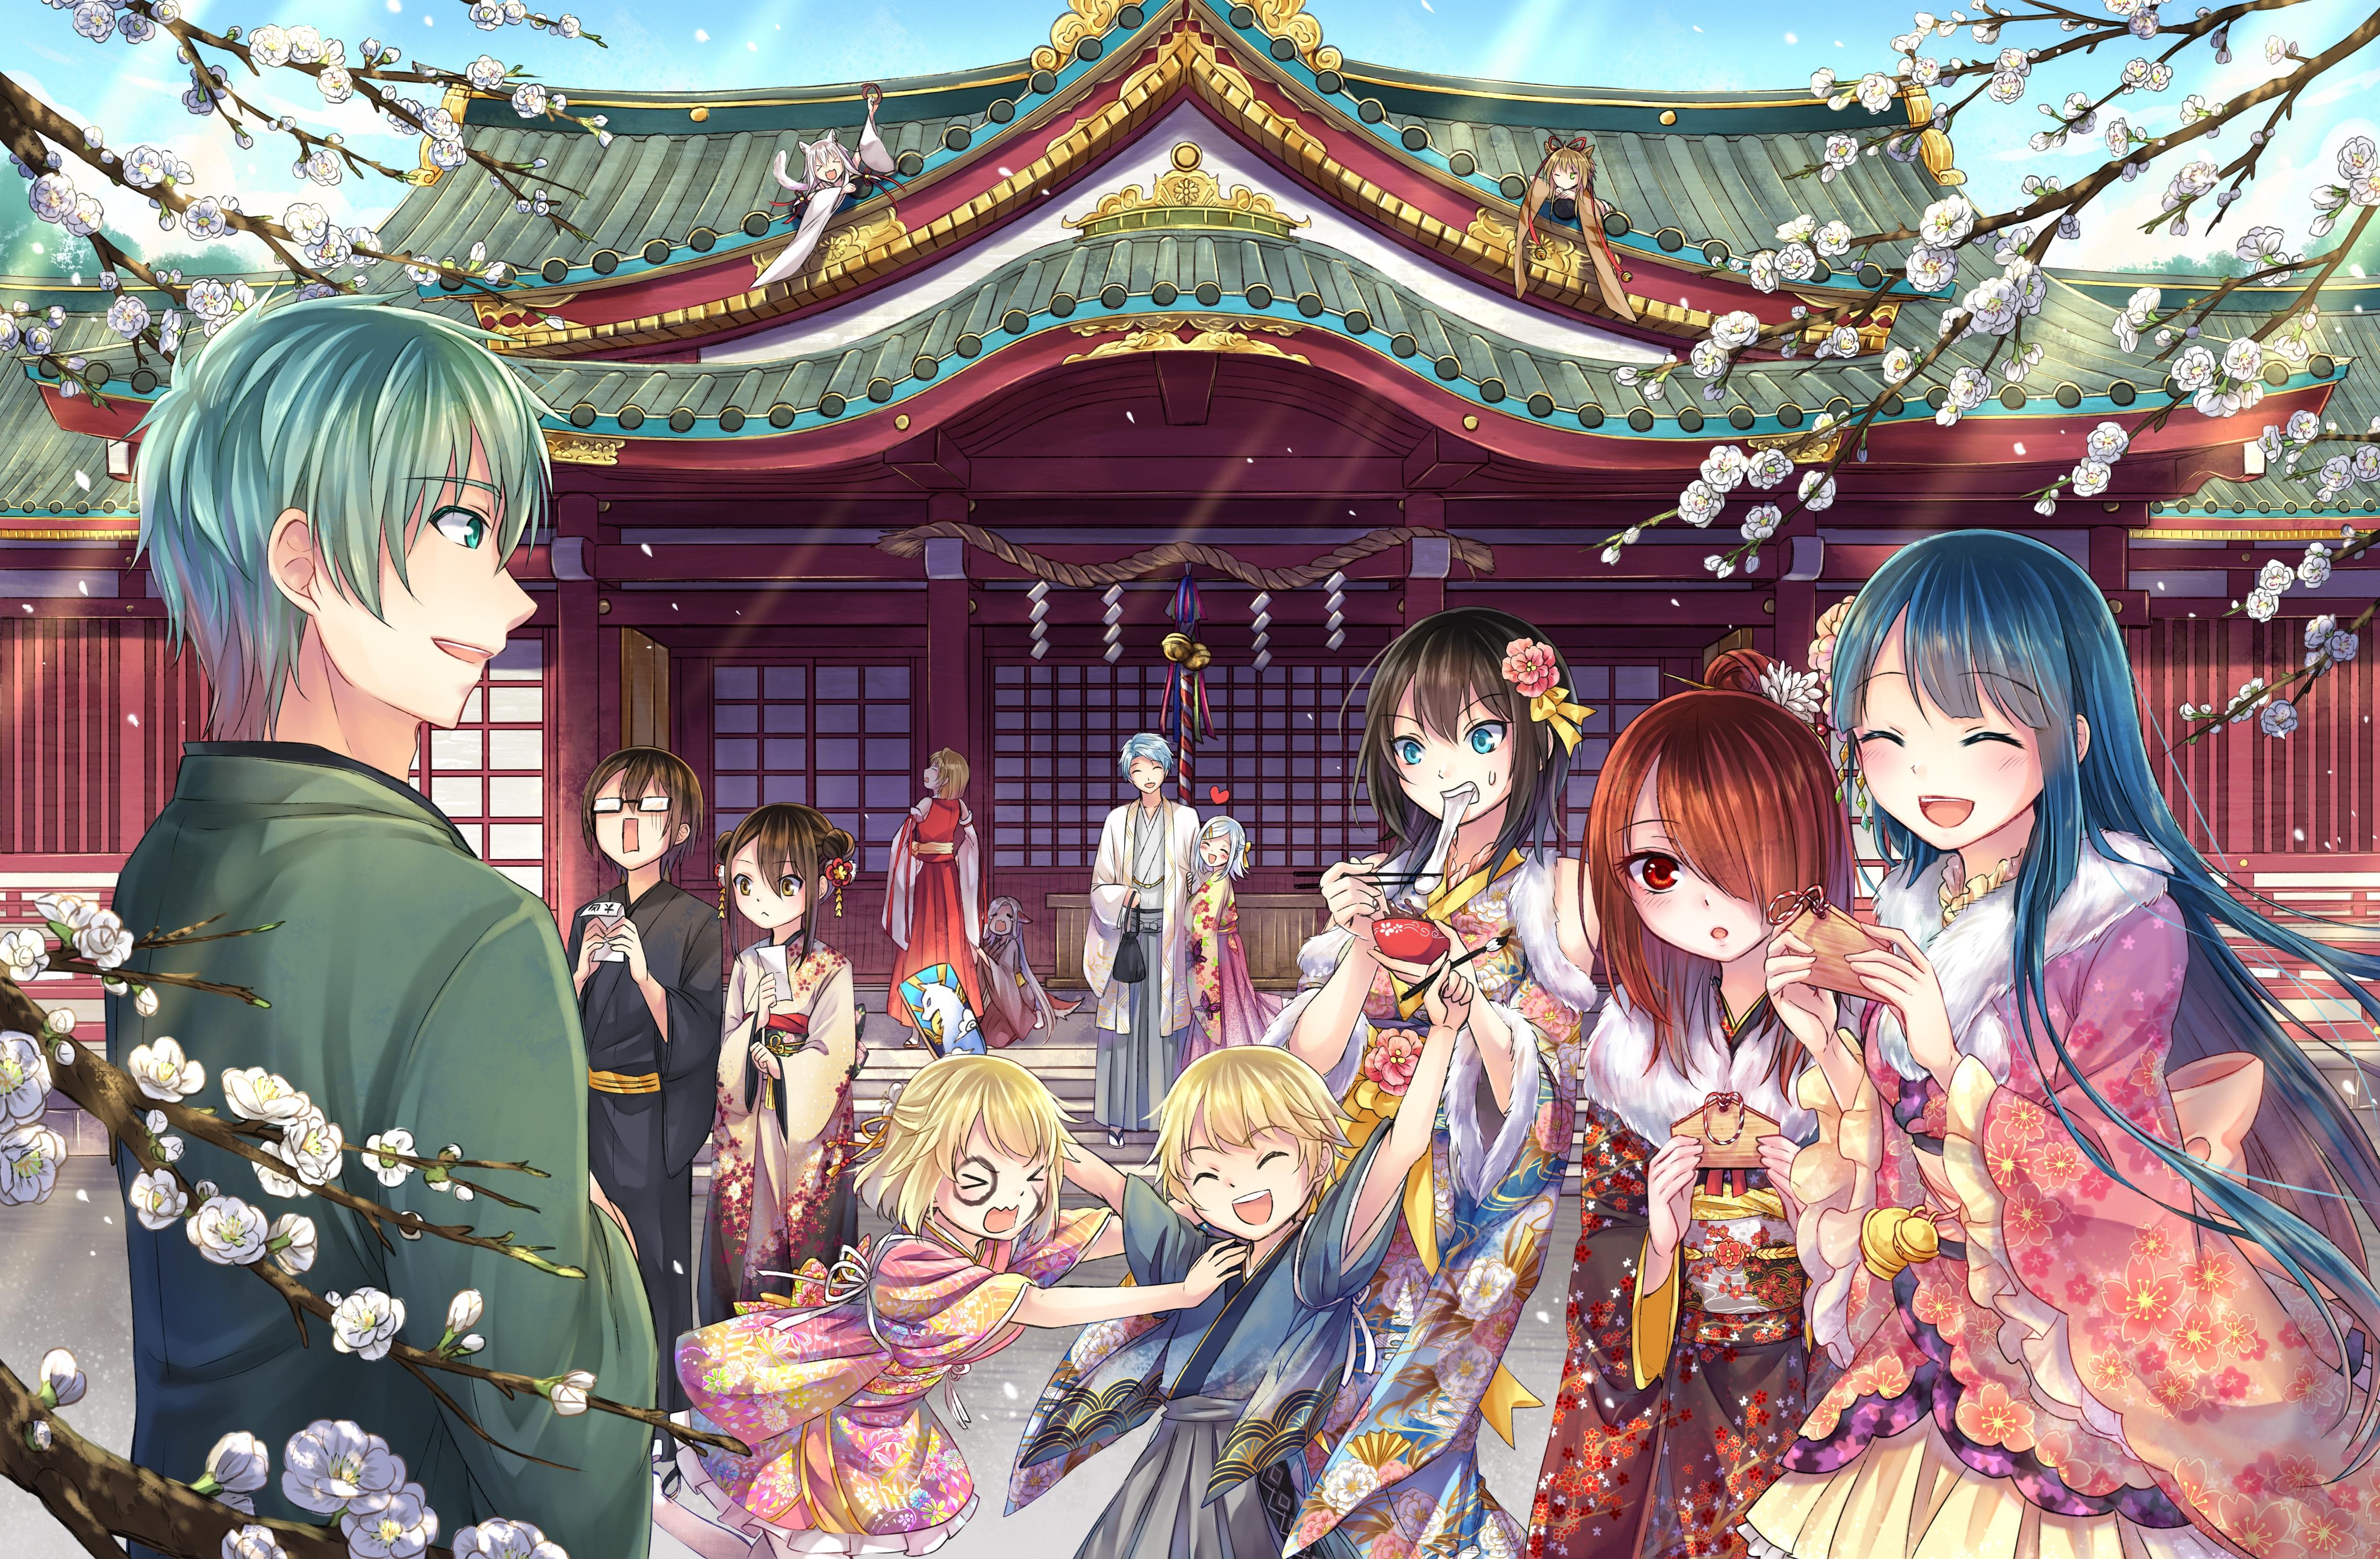 45] Happy New Year 2020 Anime Girl Wallpapers on WallpaperSafari 4688x3070